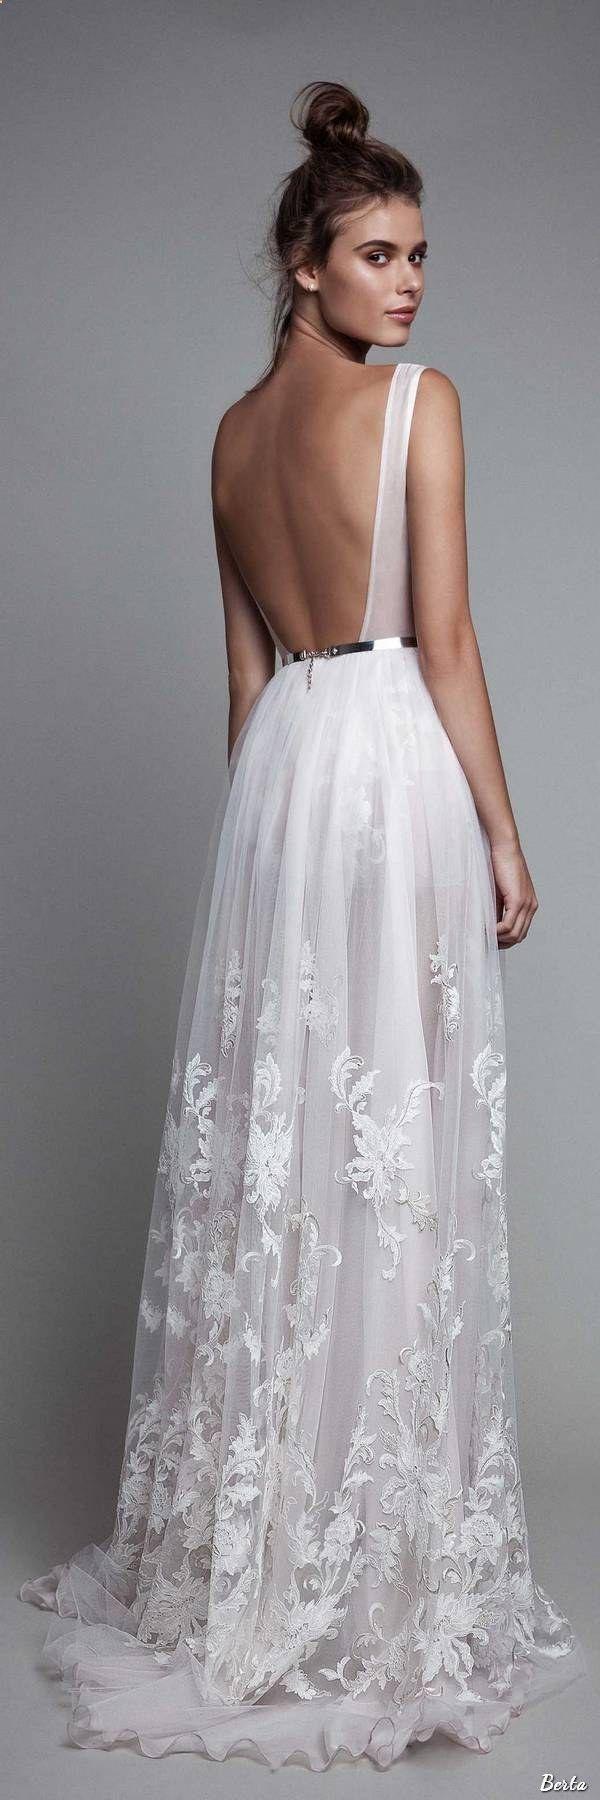 Evening  Prom Dresses | Deer Pearl Flowers / http://www.deerpearlflowers.com/evening-prom-dresses/